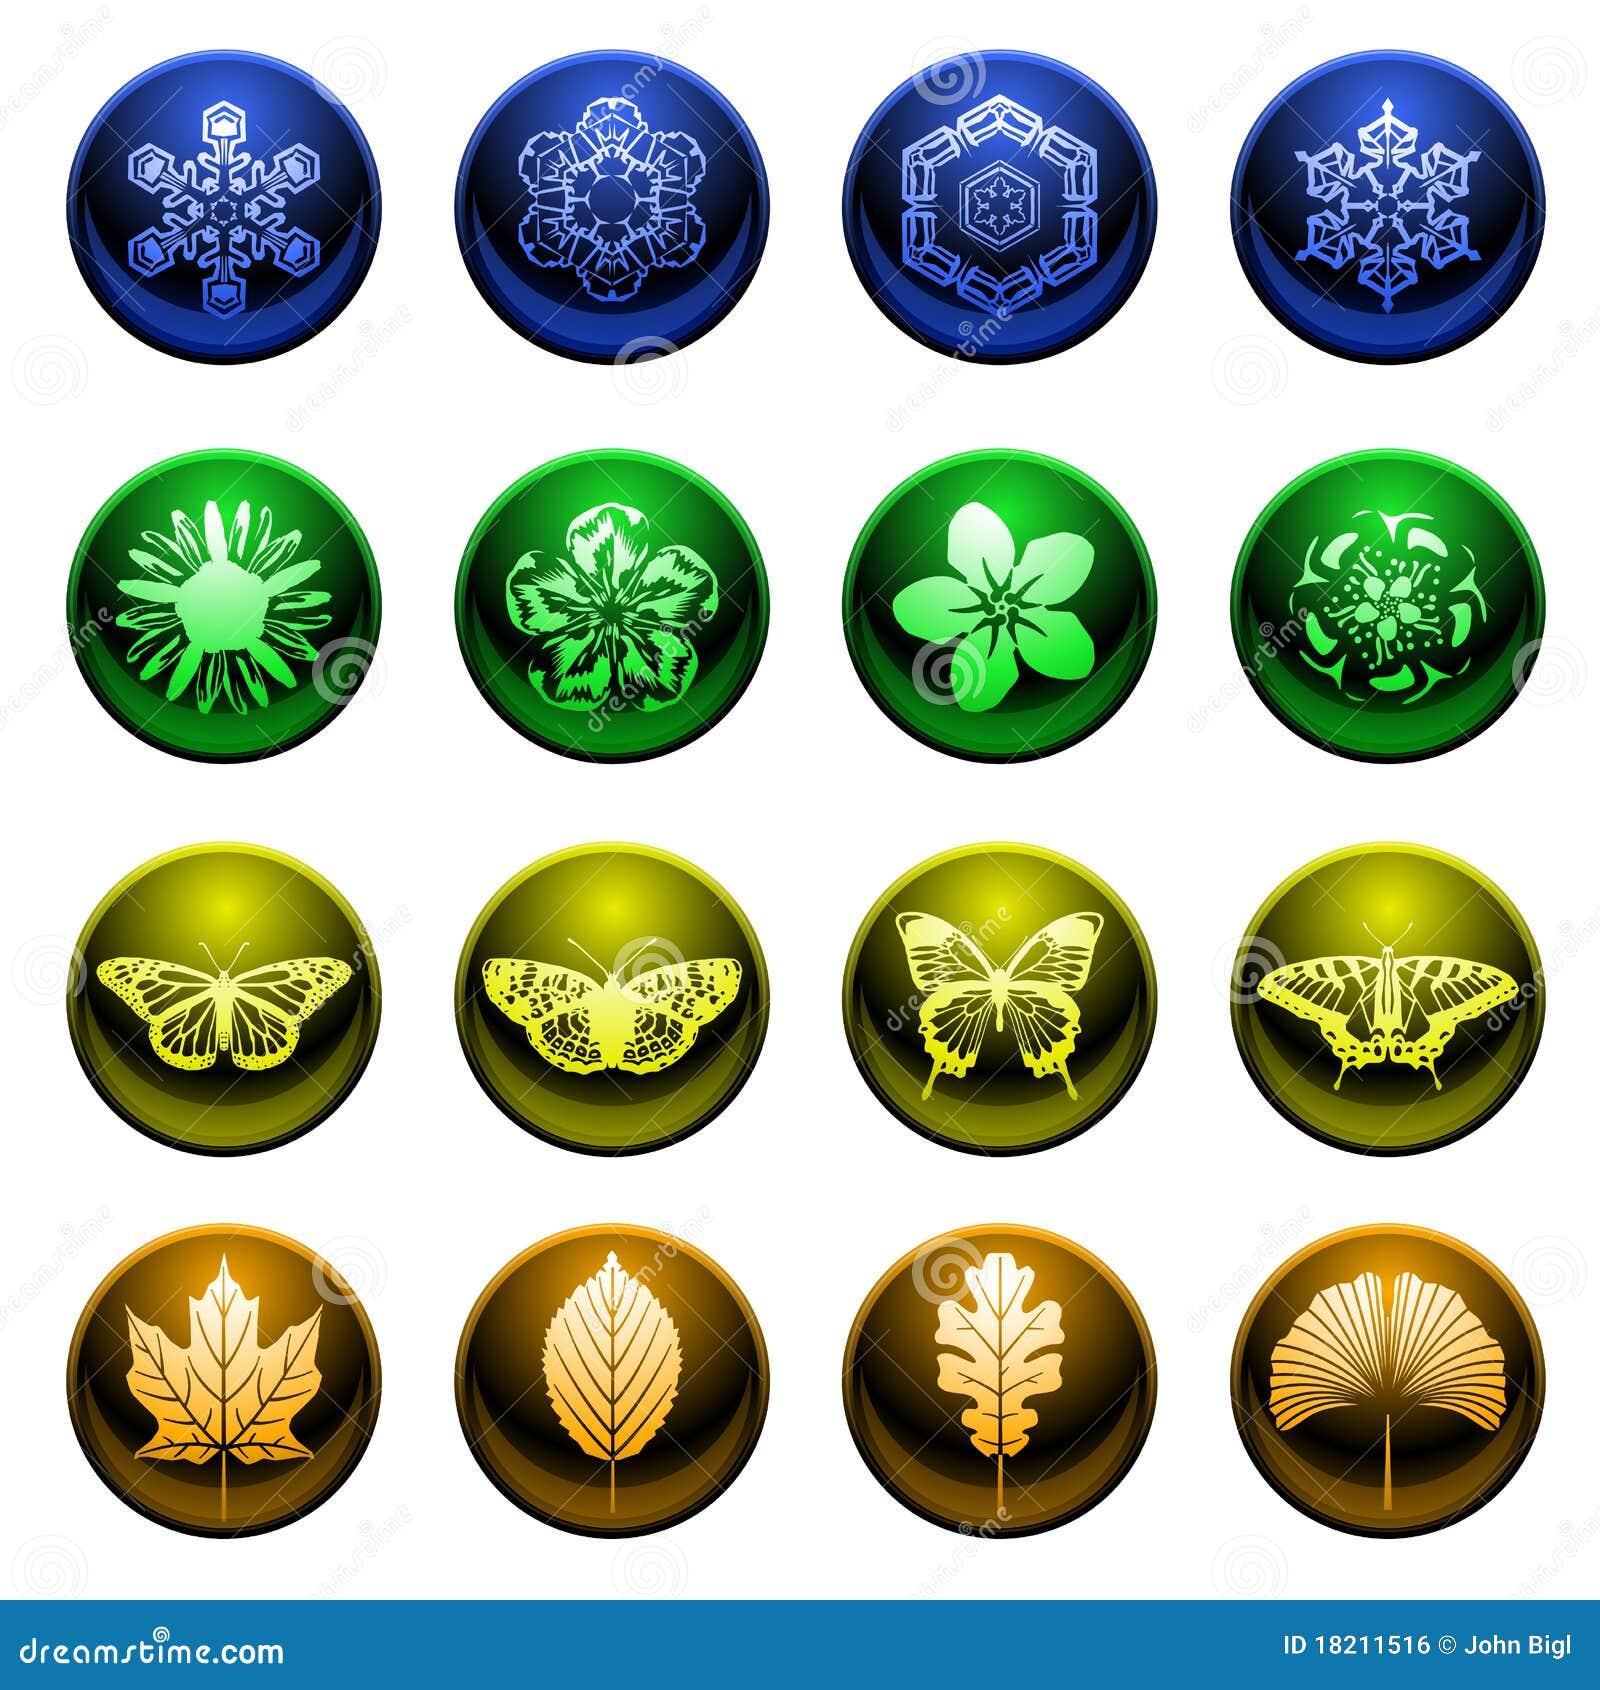 Shiny season icons